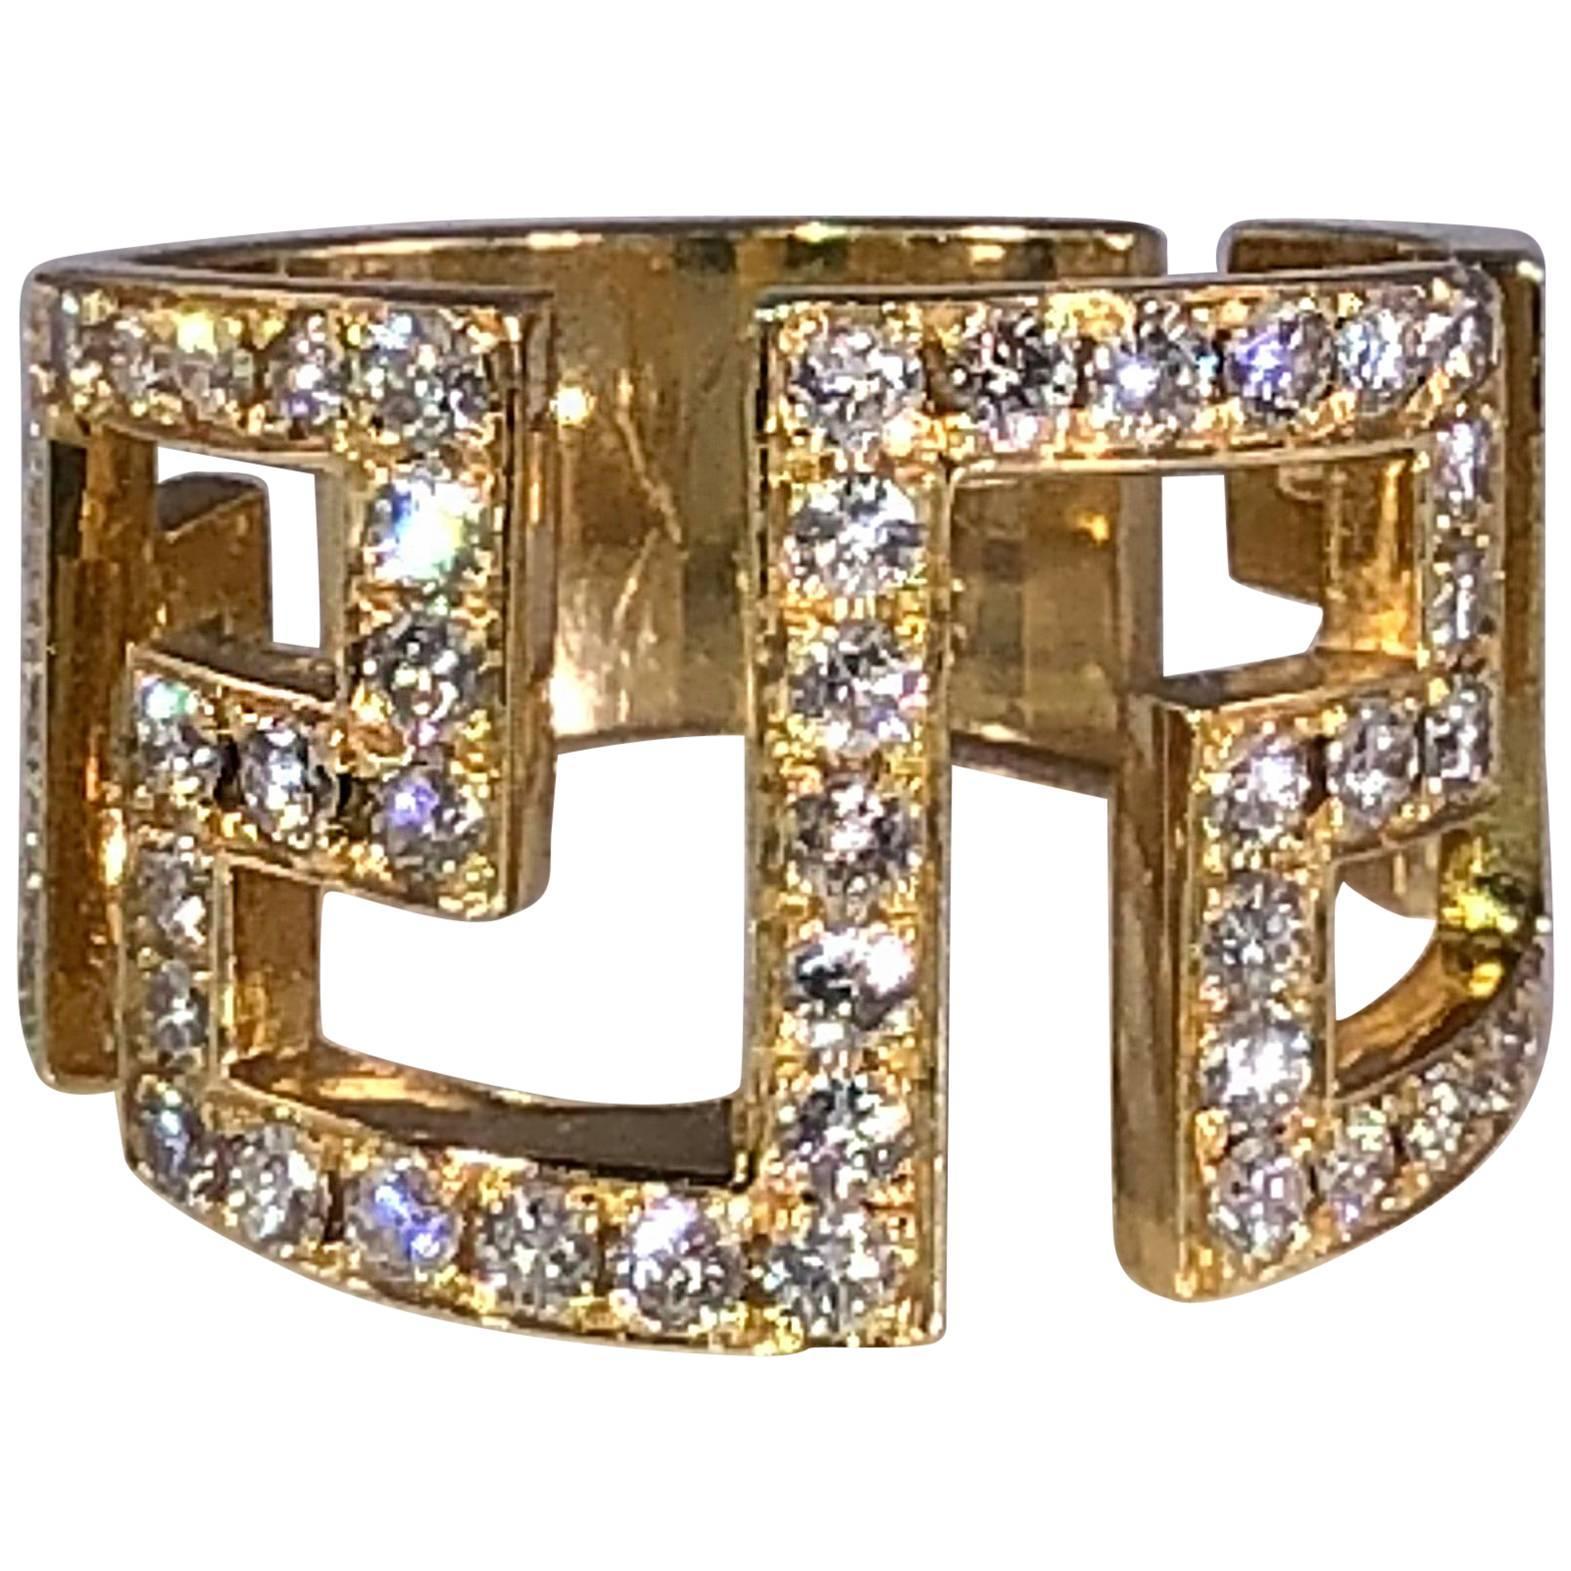 Georgios Collections 18 Karat Yellow Gold Diamond Greek Key Design Wide Ring